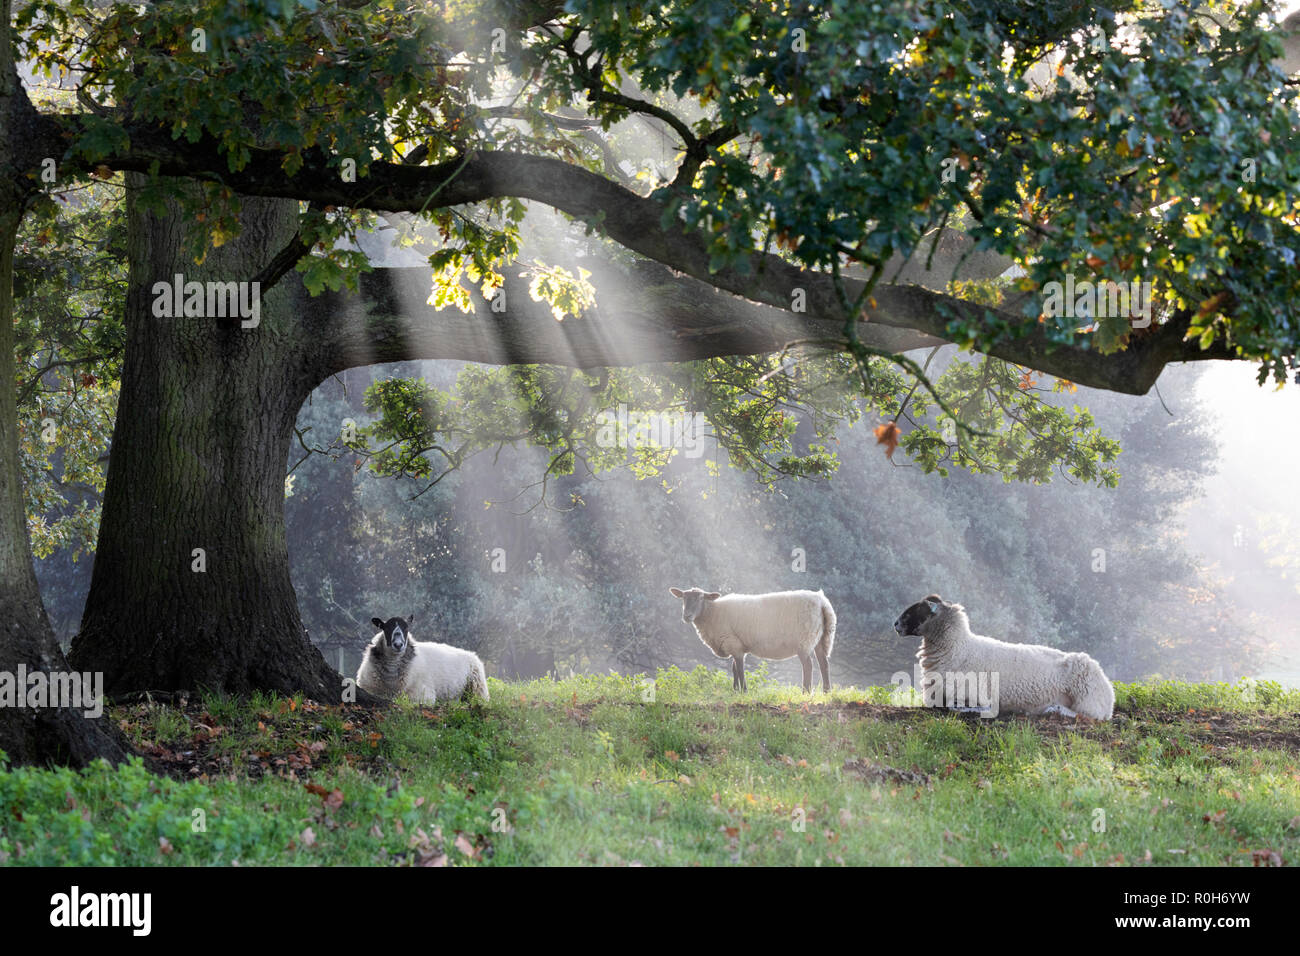 Ovejas blancas bajo el árbol con ejes de misty sunlight, Chipping Campden, Cotswolds, Gloucestershire, Inglaterra, Reino Unido, Europa Imagen De Stock